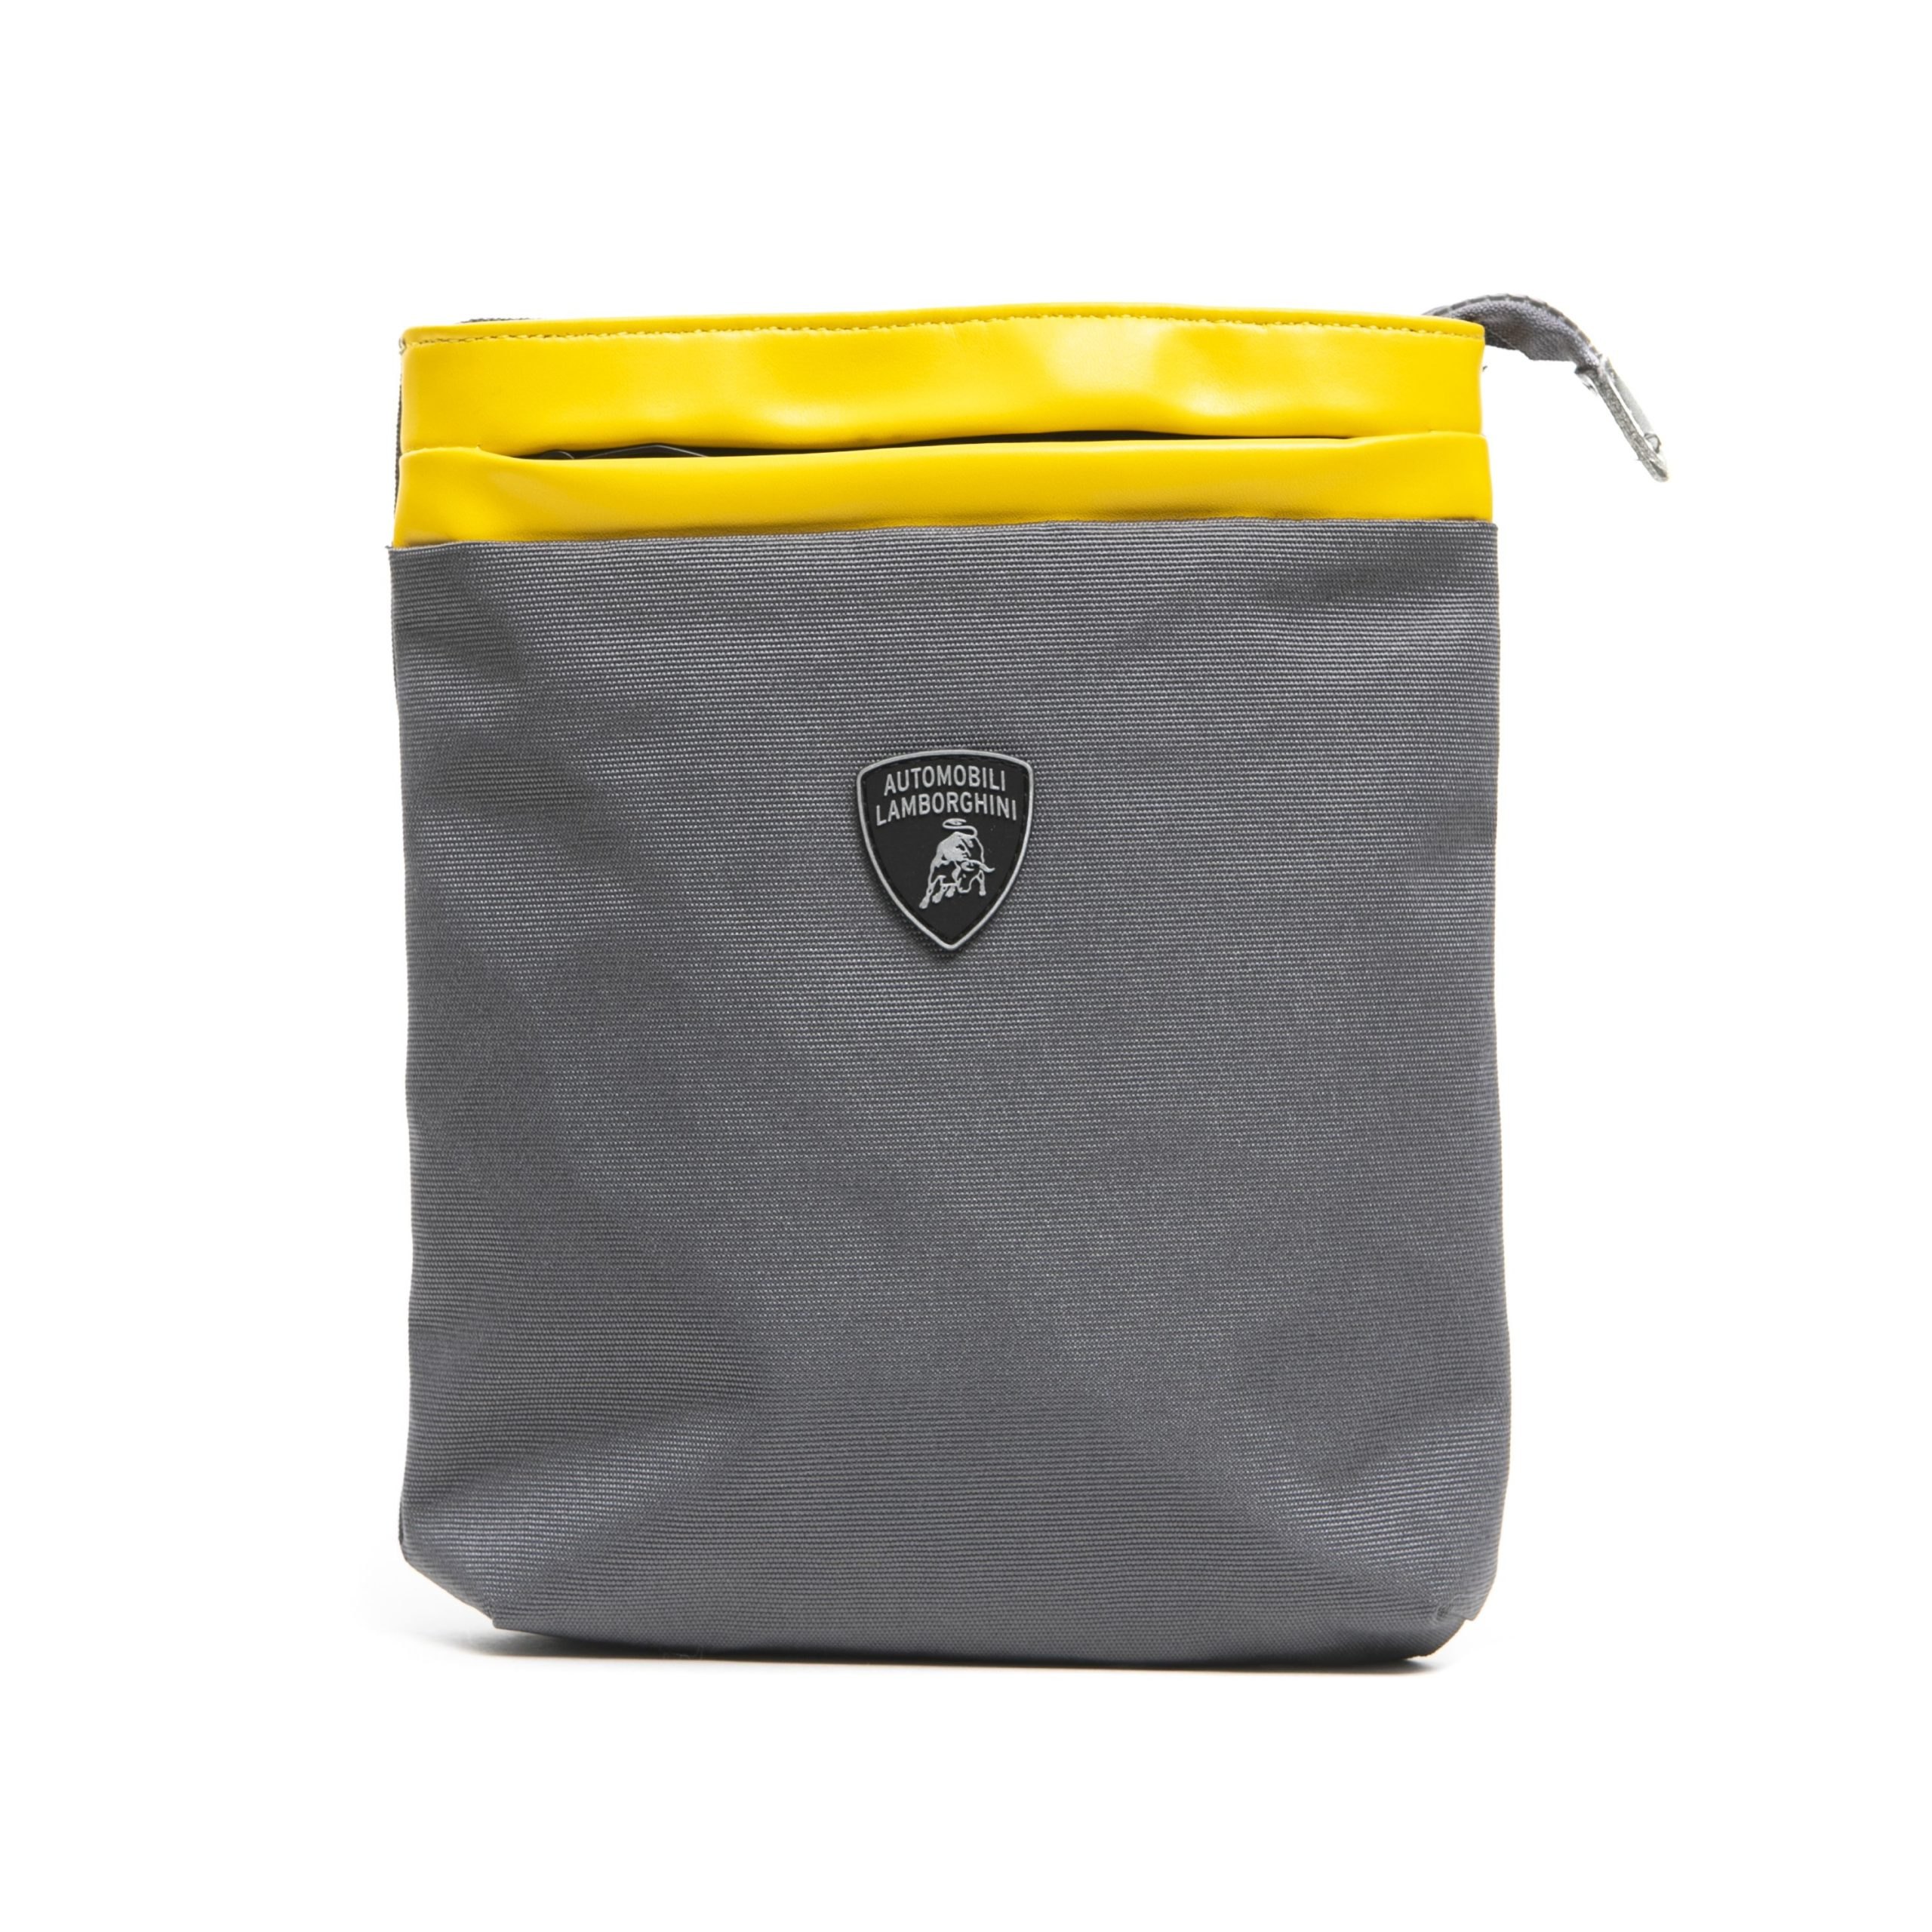 Lamborghini Men's Grigio Messenger Bag Yellow LA1265742